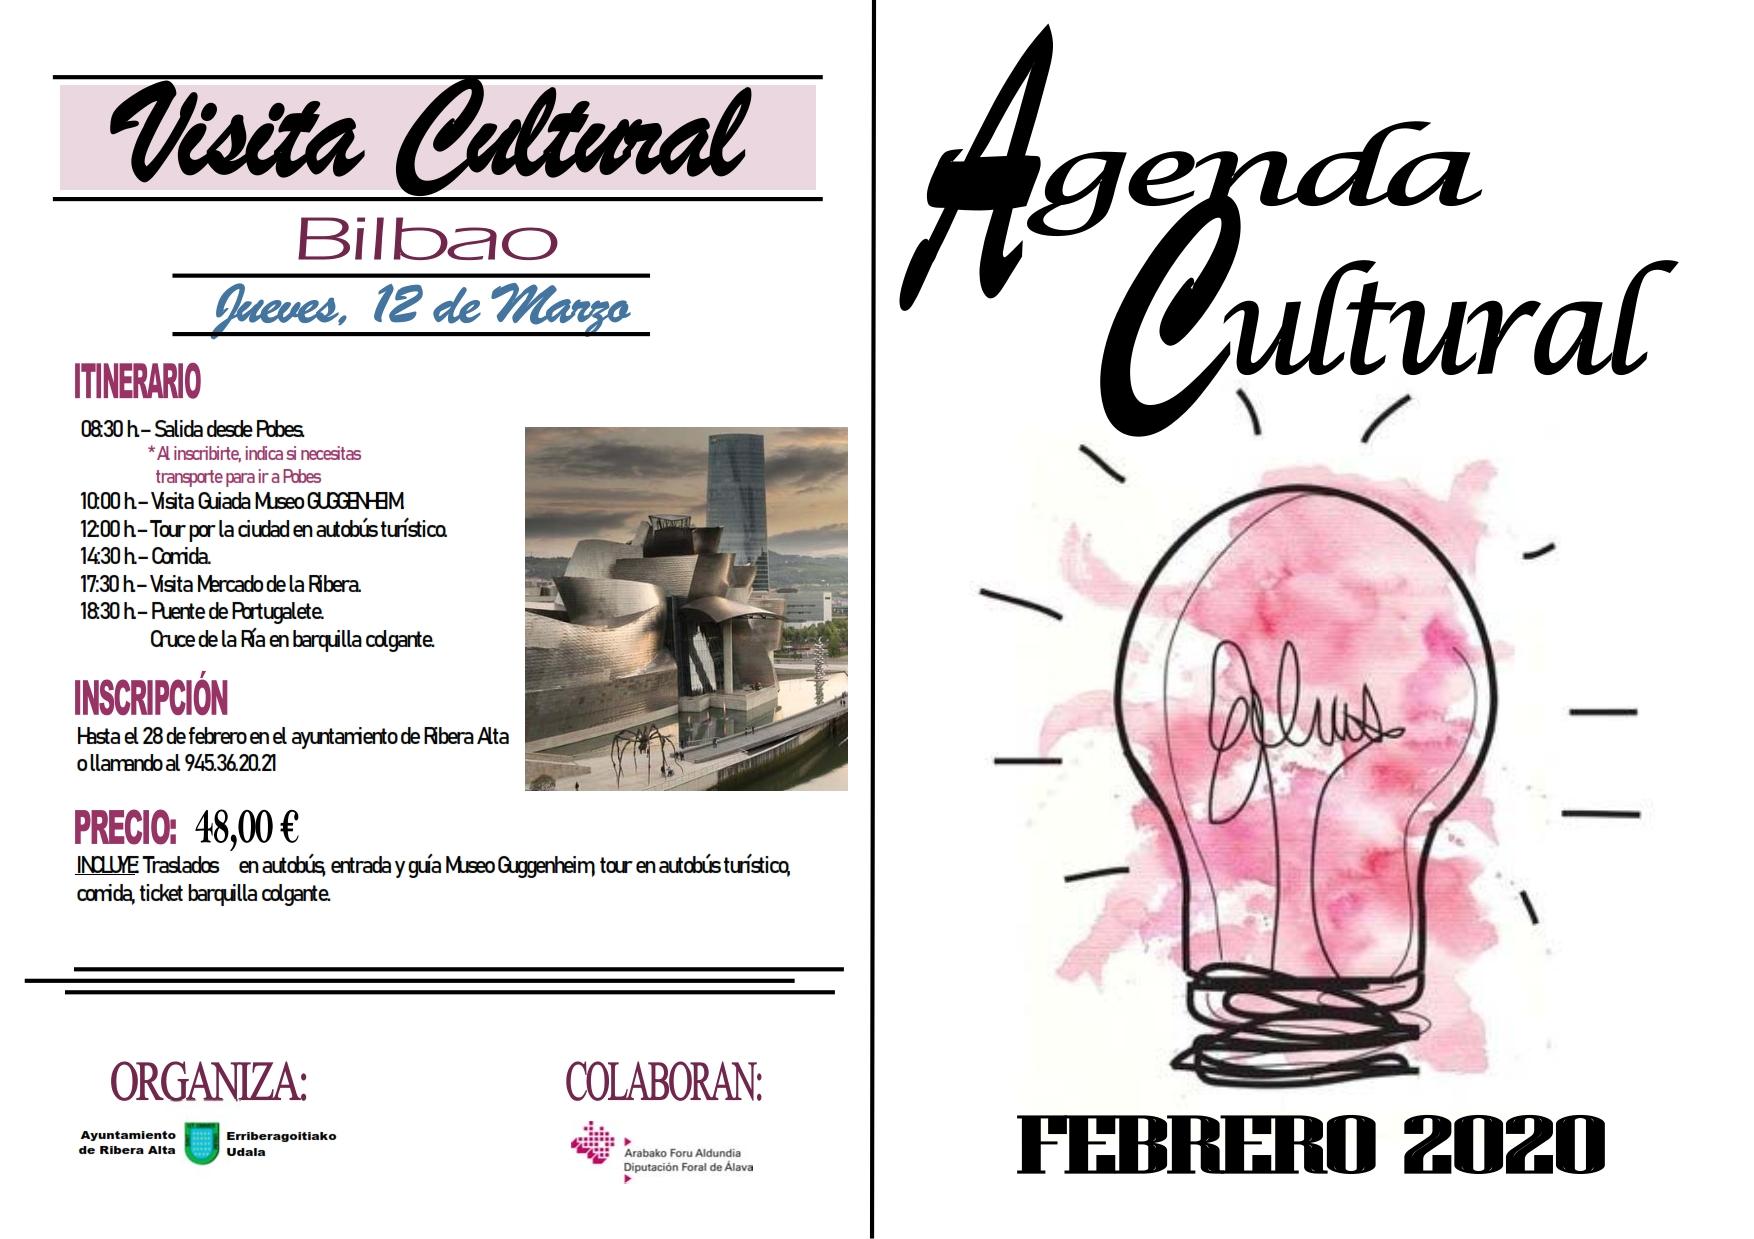 Agenda cultural febrero 2020, en Ribera alta / Erriberagoitia